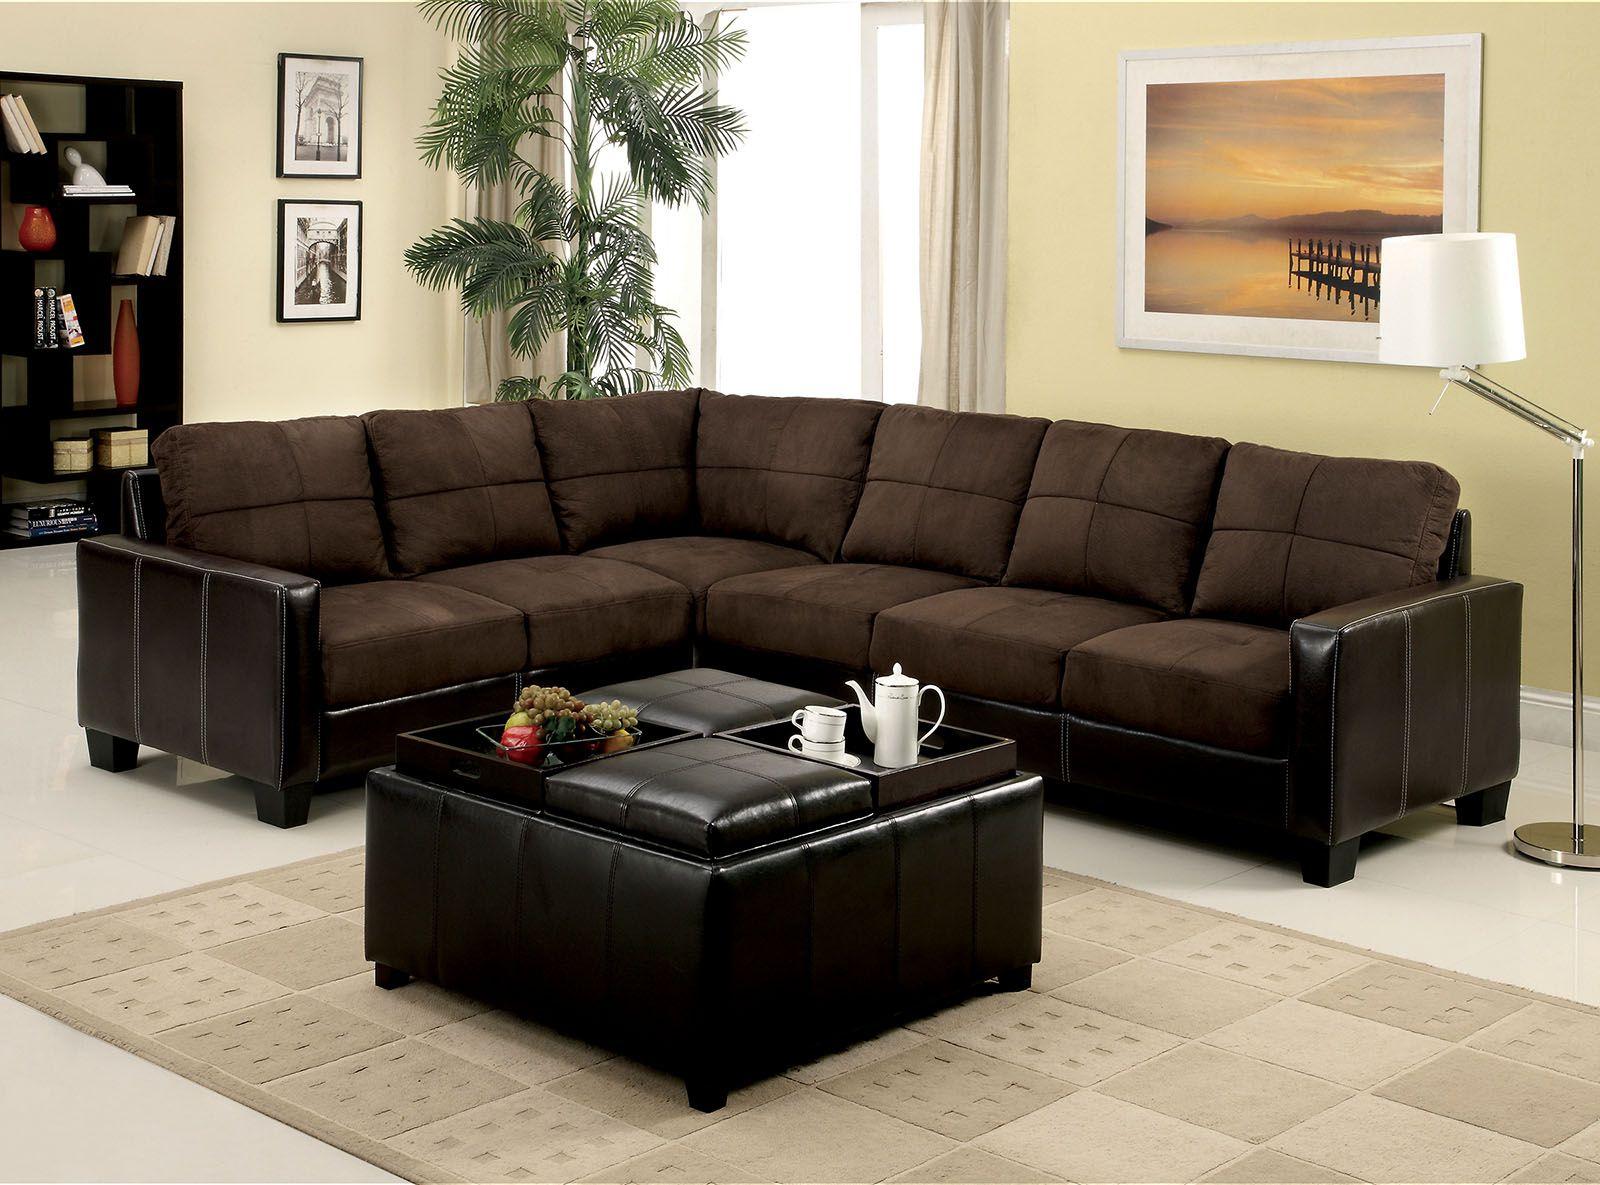 Lavena 6453dk Brown Contemporary Sectional Sofa Corner Sectional Sofa Sectional Sofa Brown Sectional Sofa